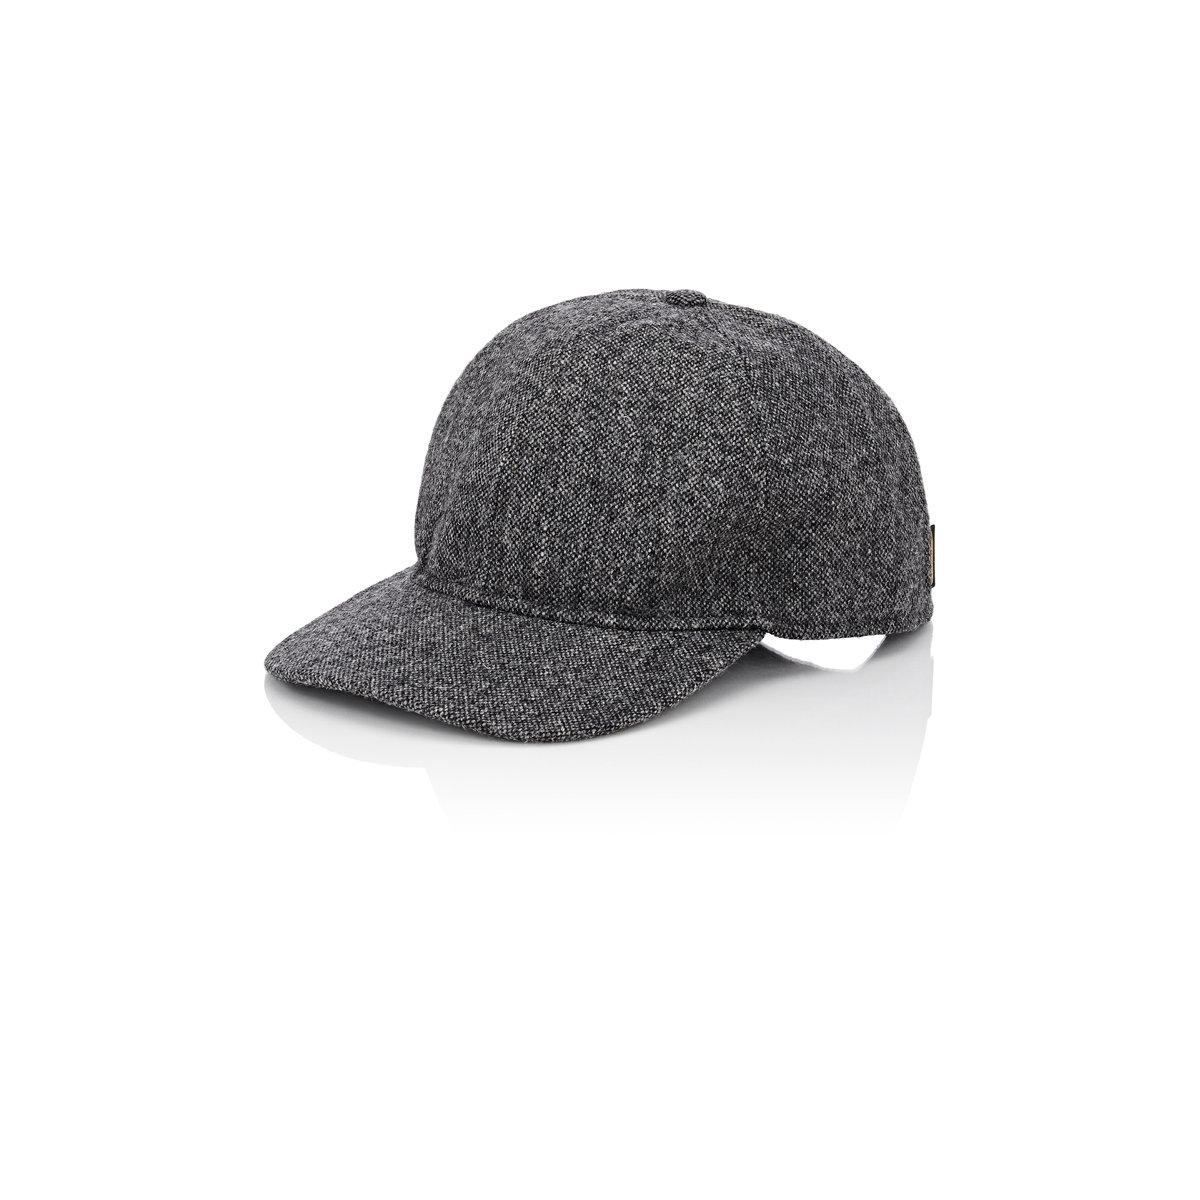 3ff703bb835 Lyst - Borsalino Men s Tweed Baseball Cap in Gray for Men